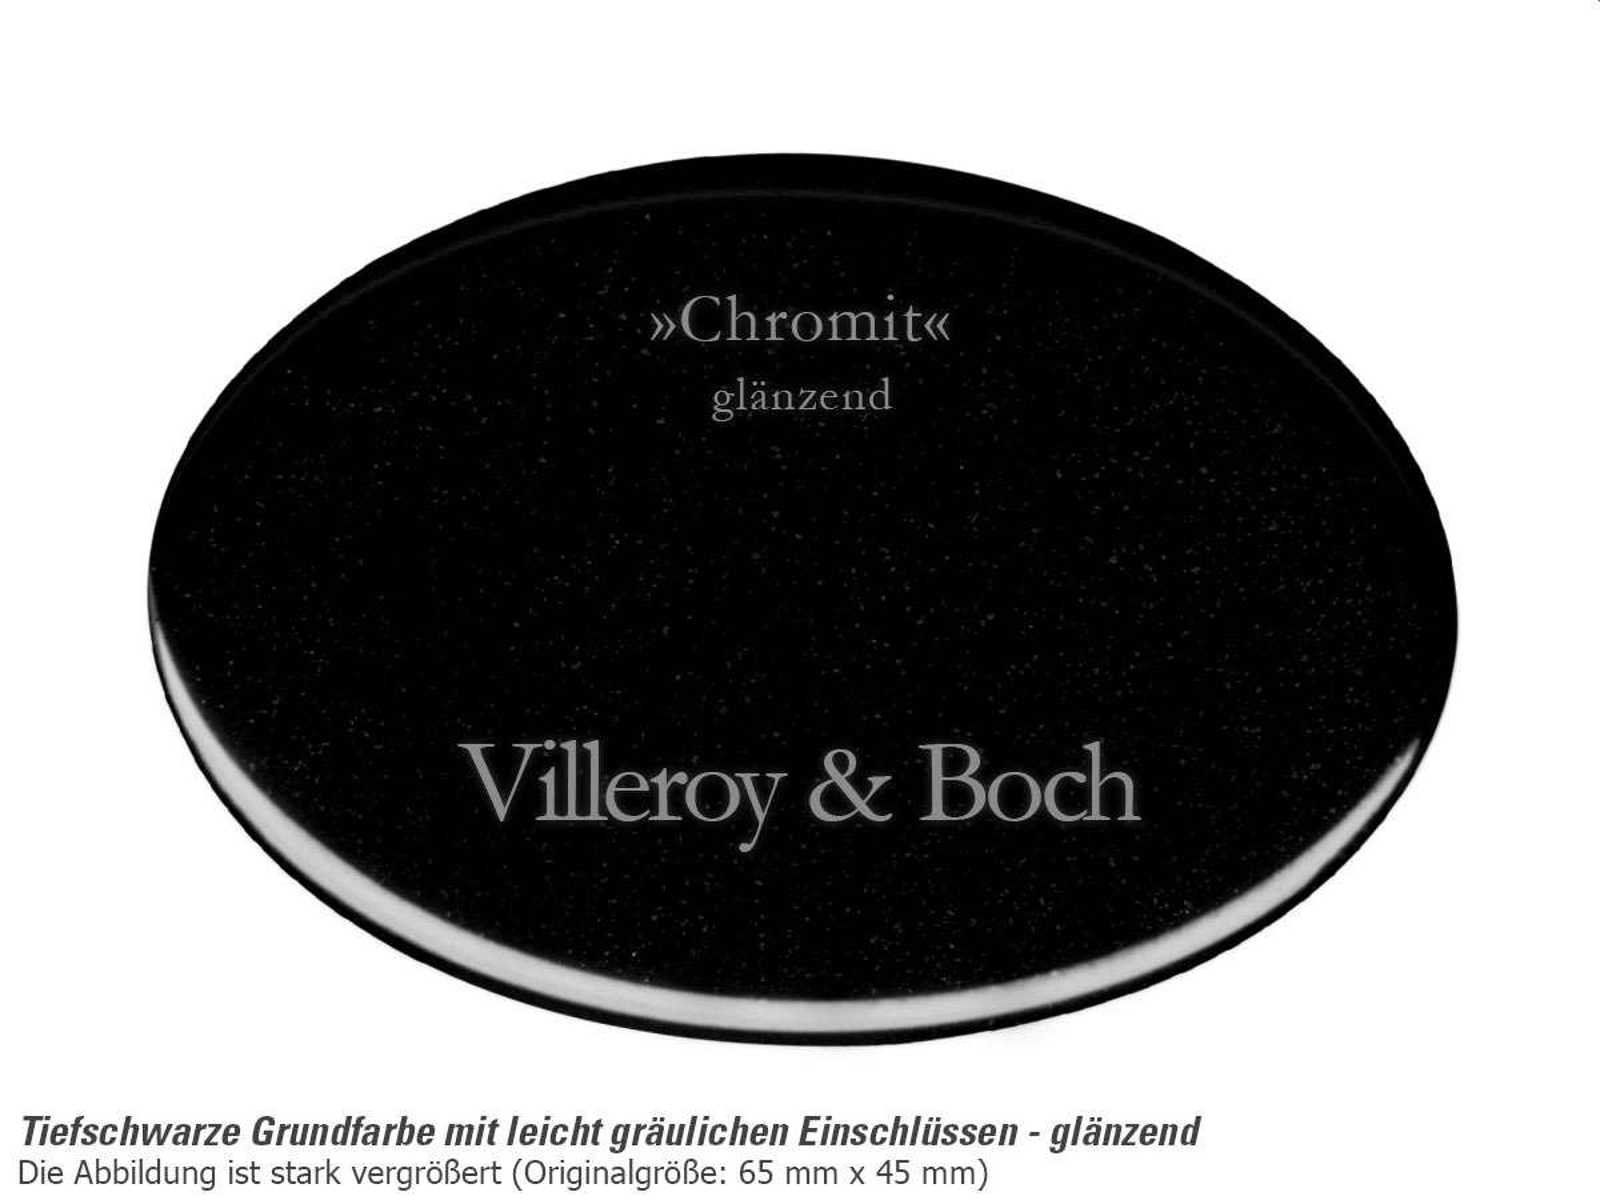 Villeroy & Boch Subway 80 Chromit - 6726 02 J0 Keramikspüle Exzenterbetätigung